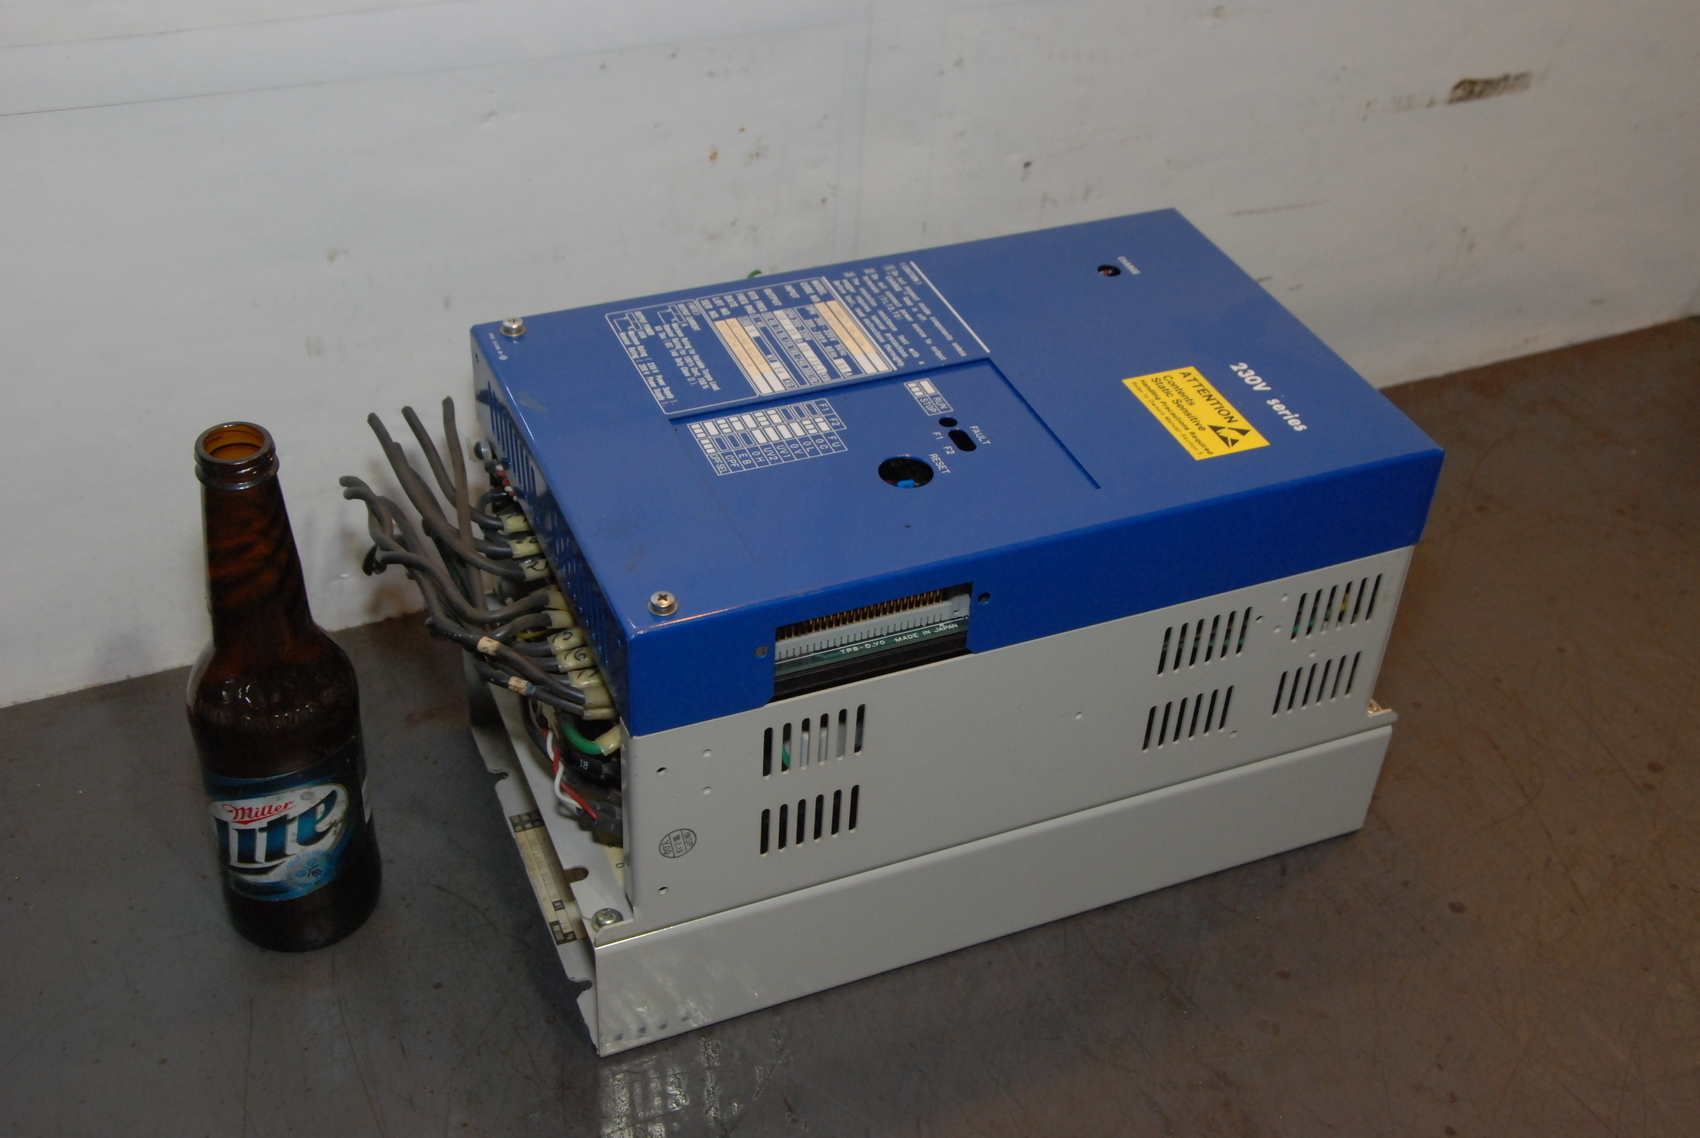 Yaskawa/Hurco CIMR-7.5B.D06 Spindle Drive Unit,230V